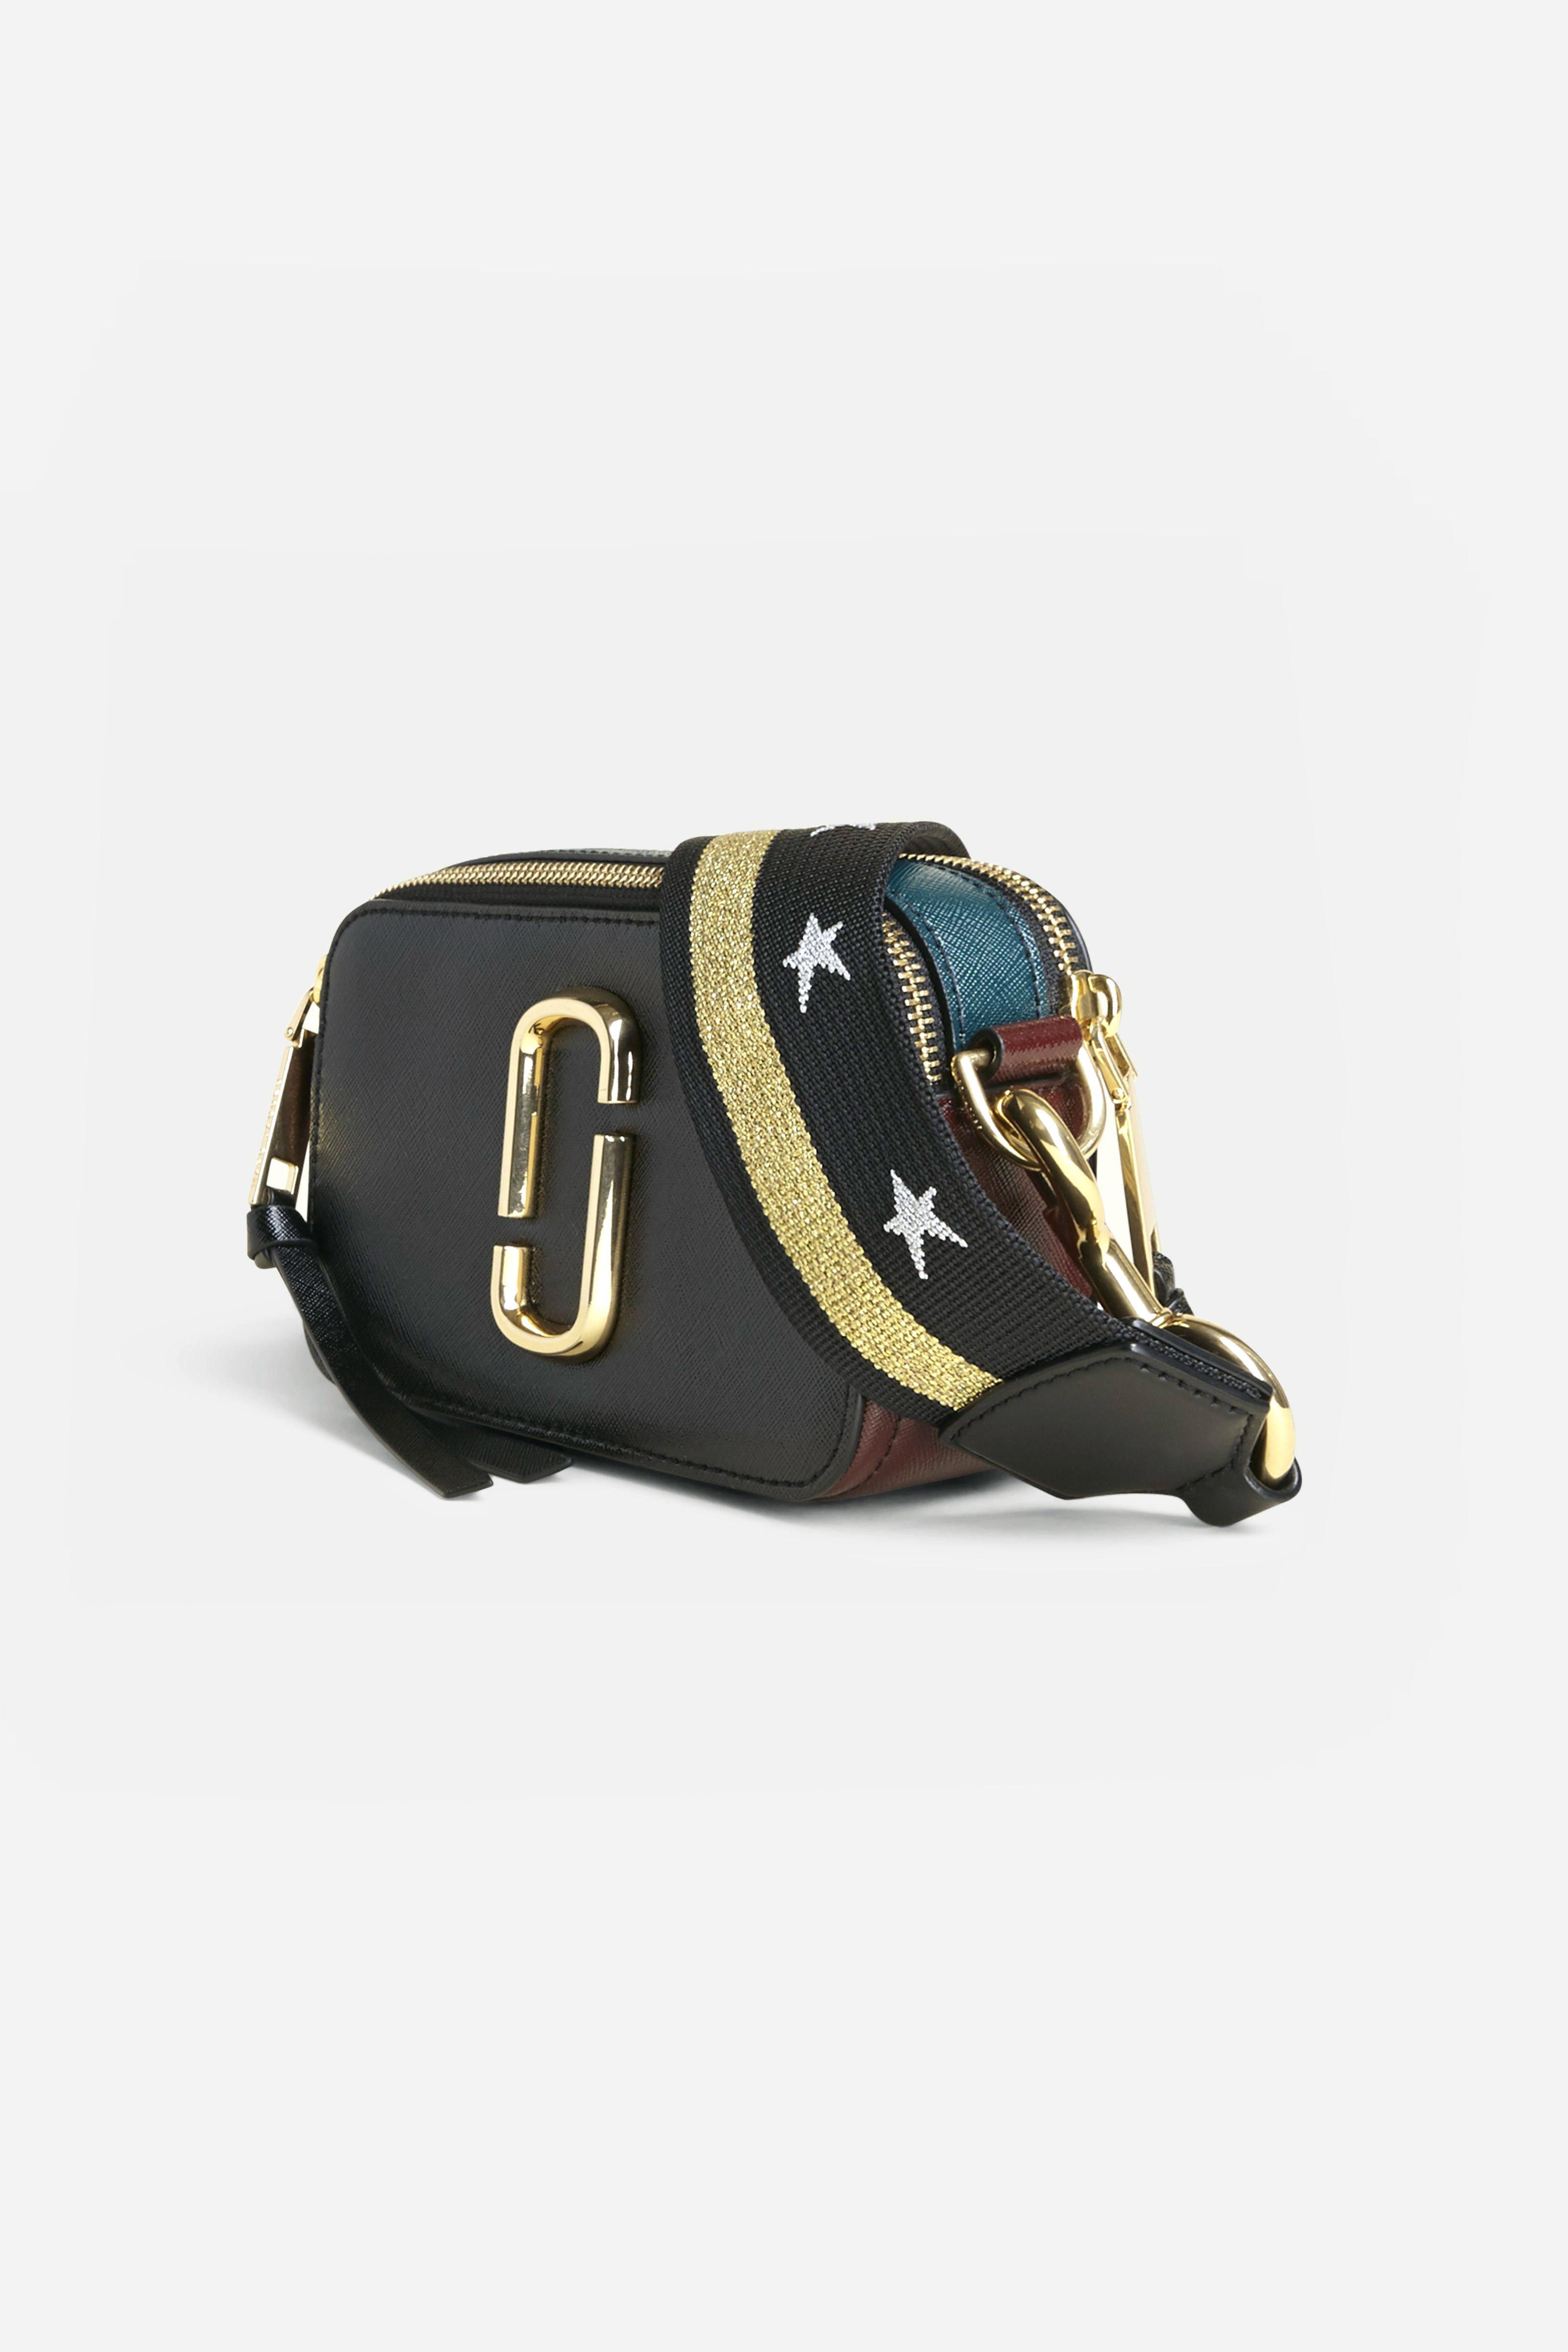 Marc Jacobs 5 - Snapshot Camera Bag - Black